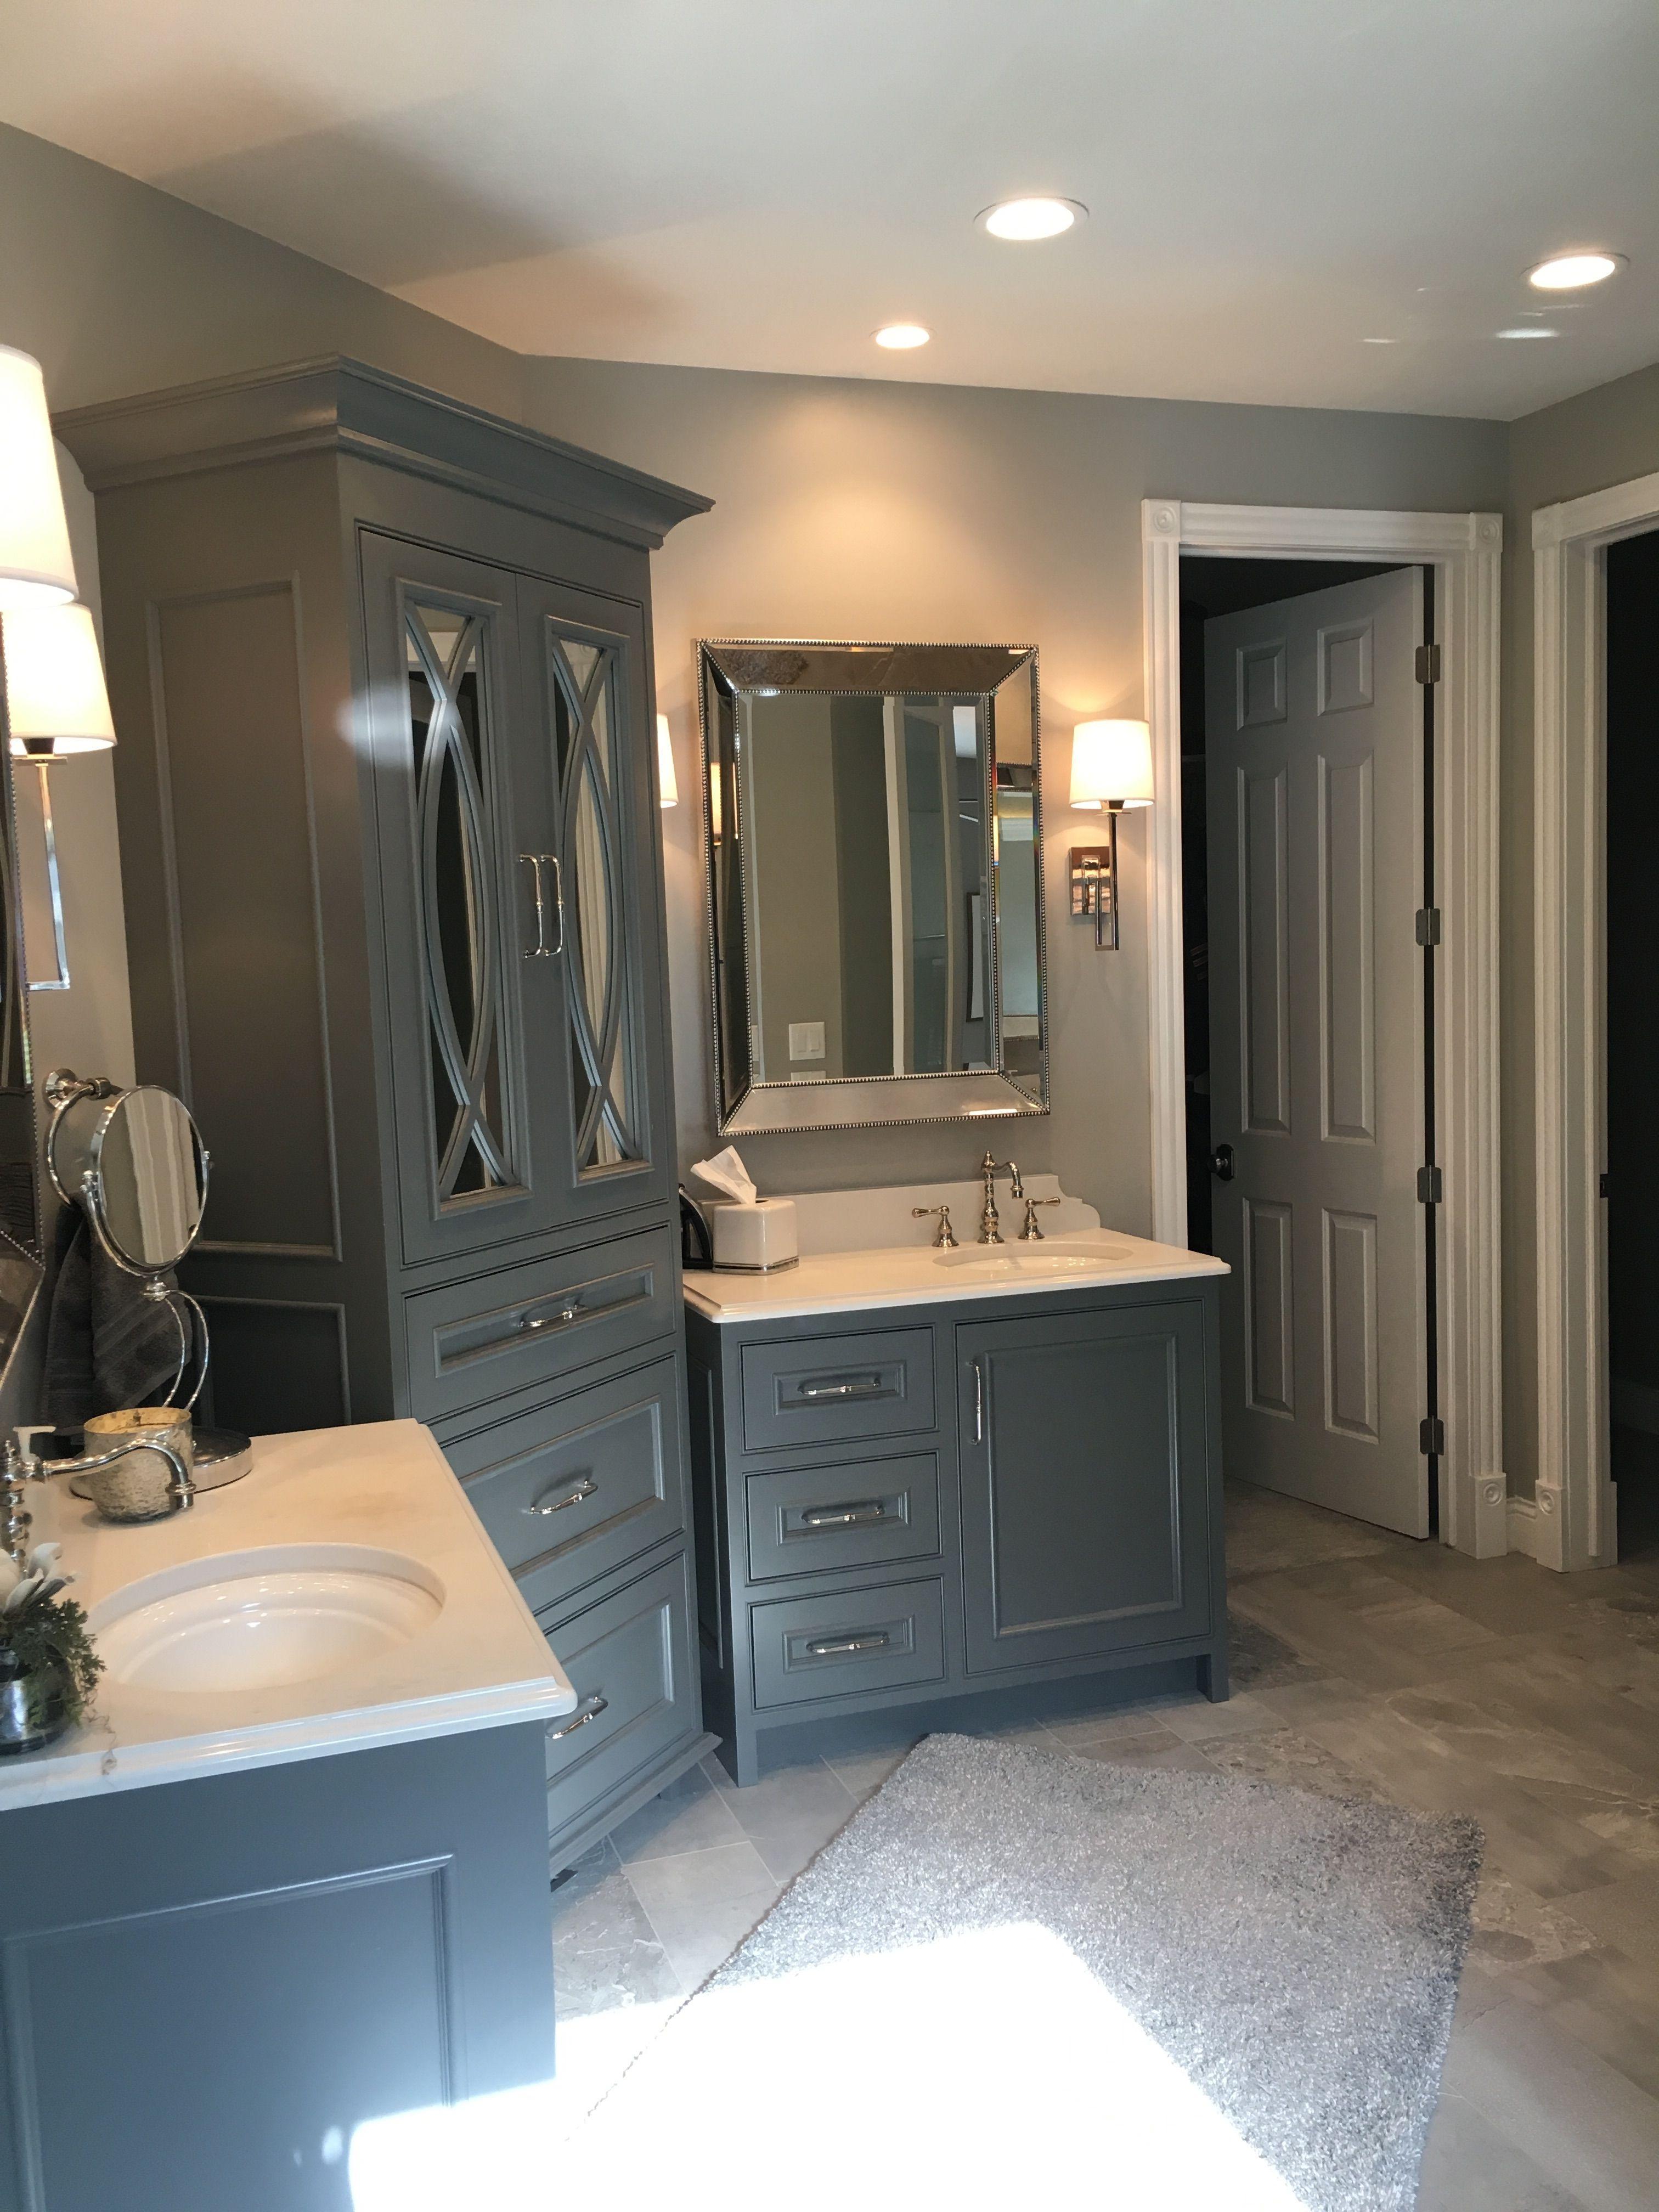 Master Bath, Double Vanities, Gauntlet Gray paint on cabinets